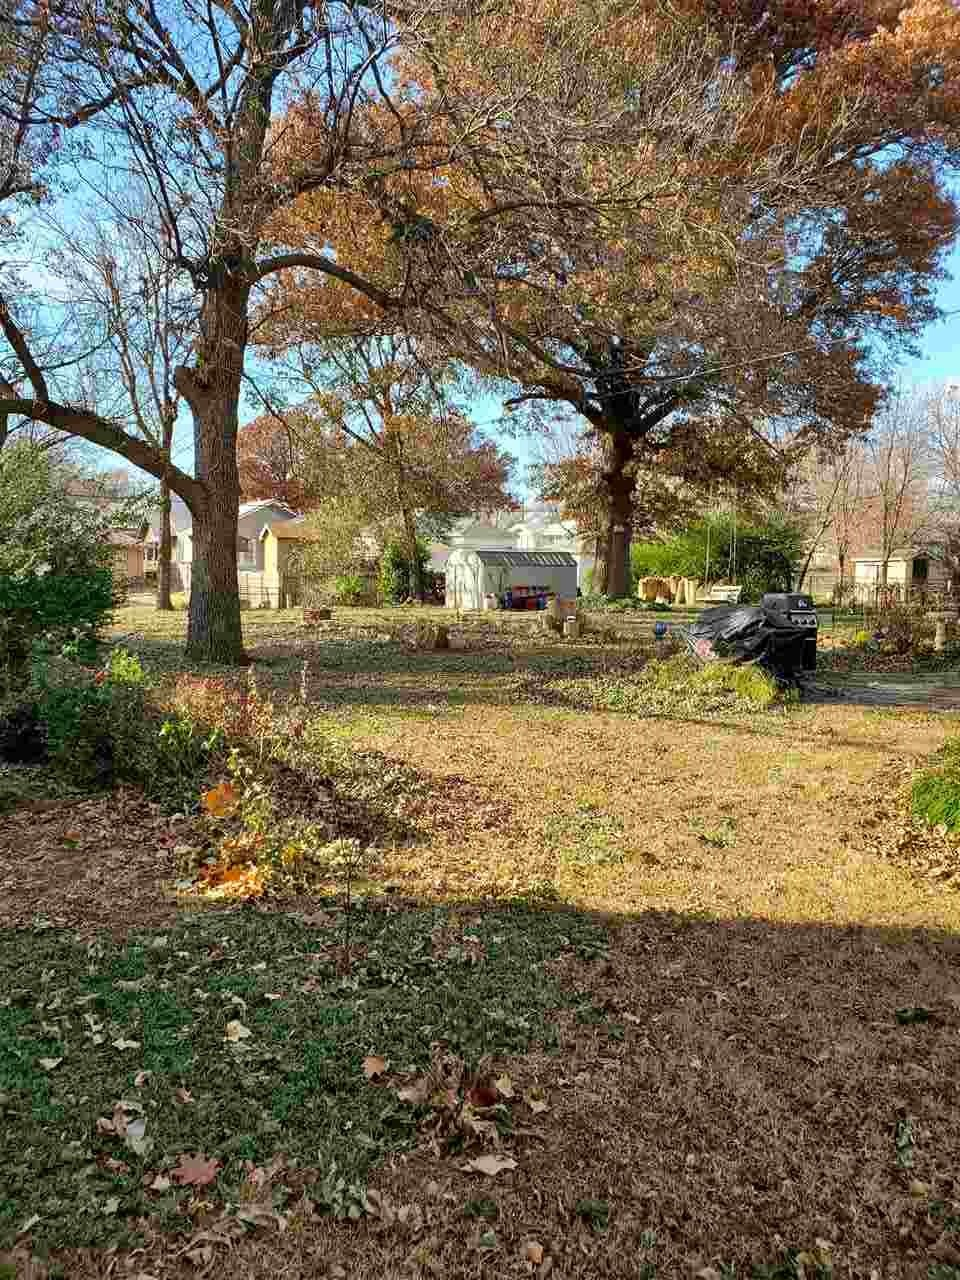 #century21groupone,#homesforsaleponcacity,#poncacityrealestate | 1106 S 7th Street  Ponca City, OK 74601-0 3